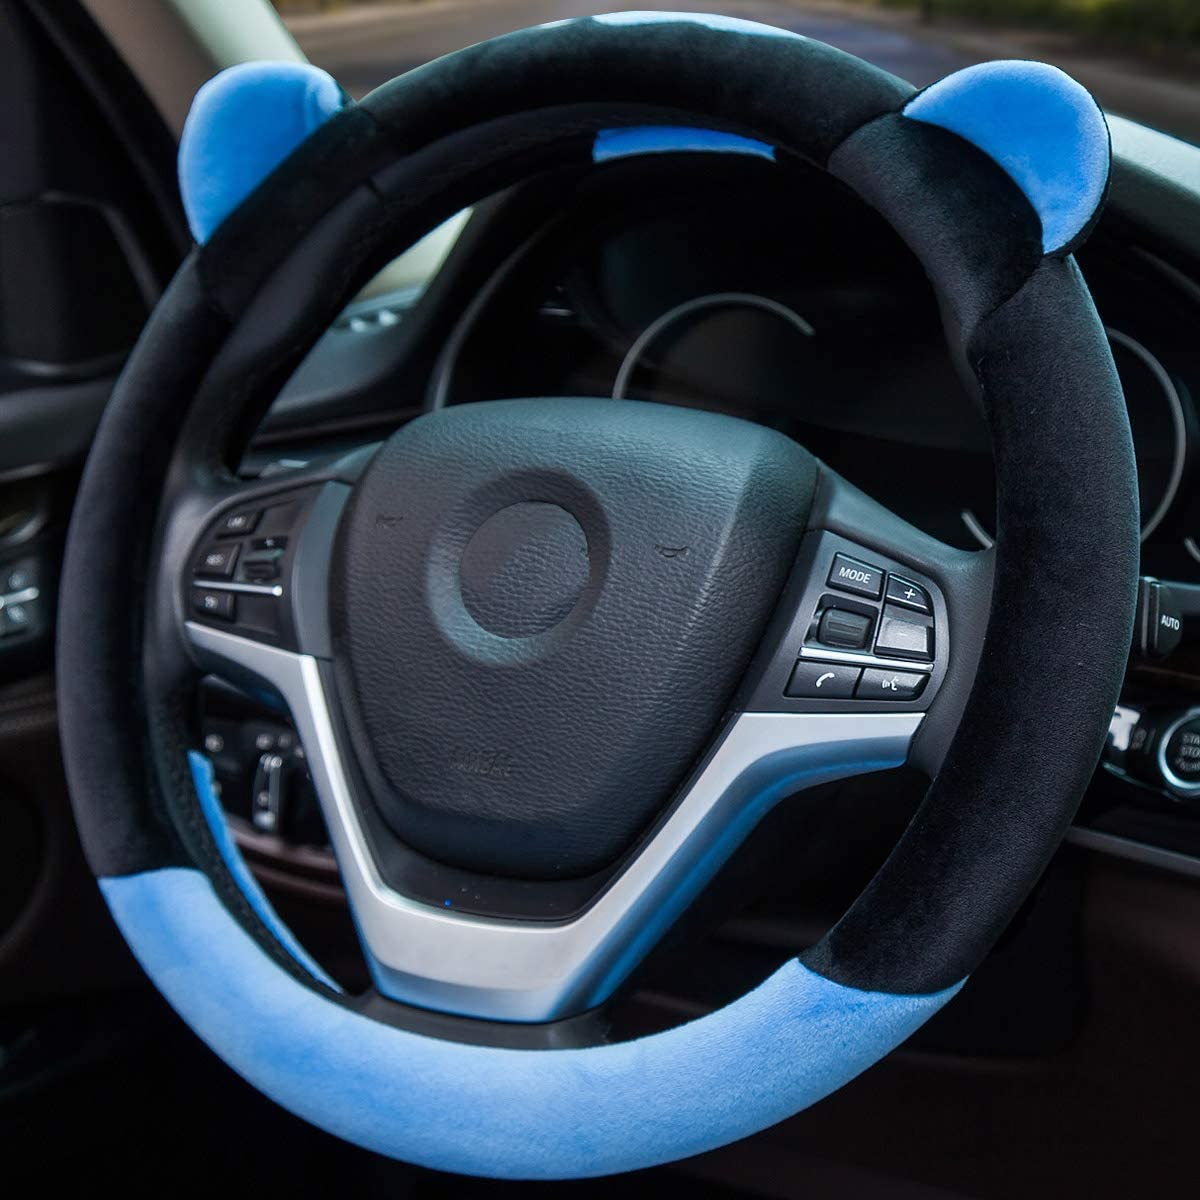 ChuLian Cute Winter Warm Plush Auto Car Steering Wheel Cover for Women Girls